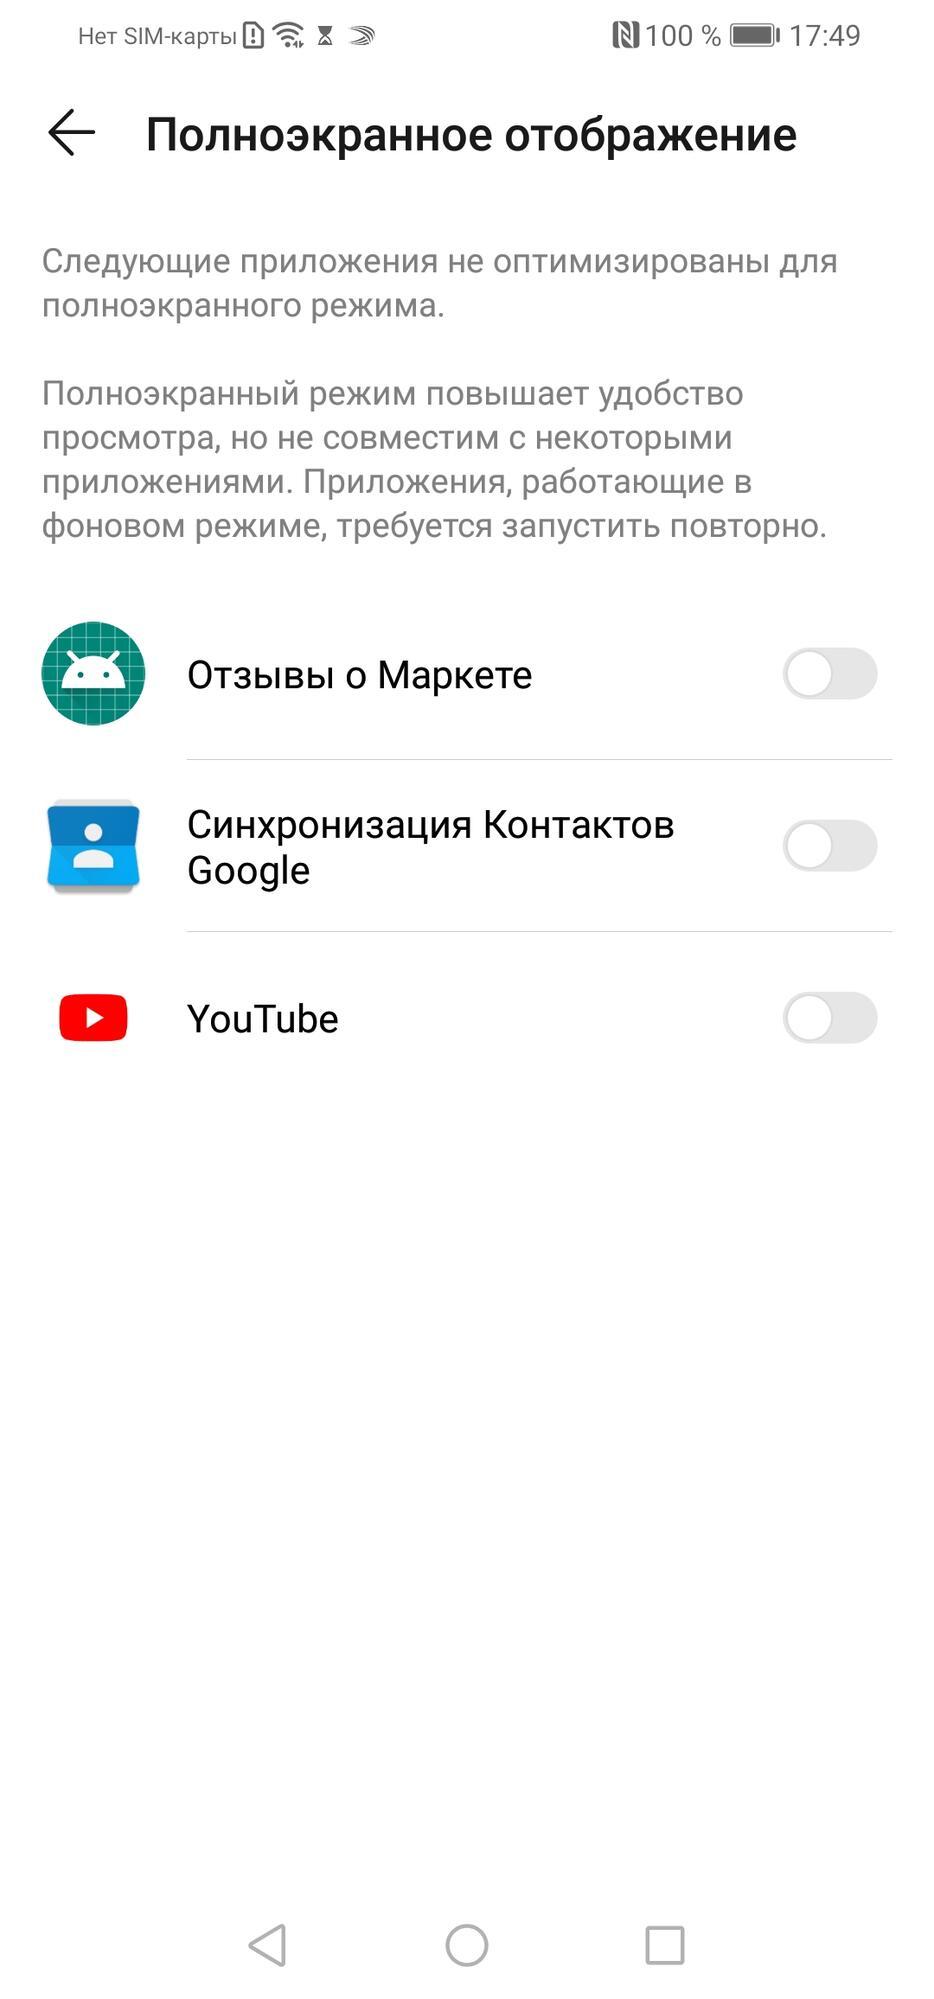 Smartfony i aksessuary - Obzor smartfona Huawei P30 Lite